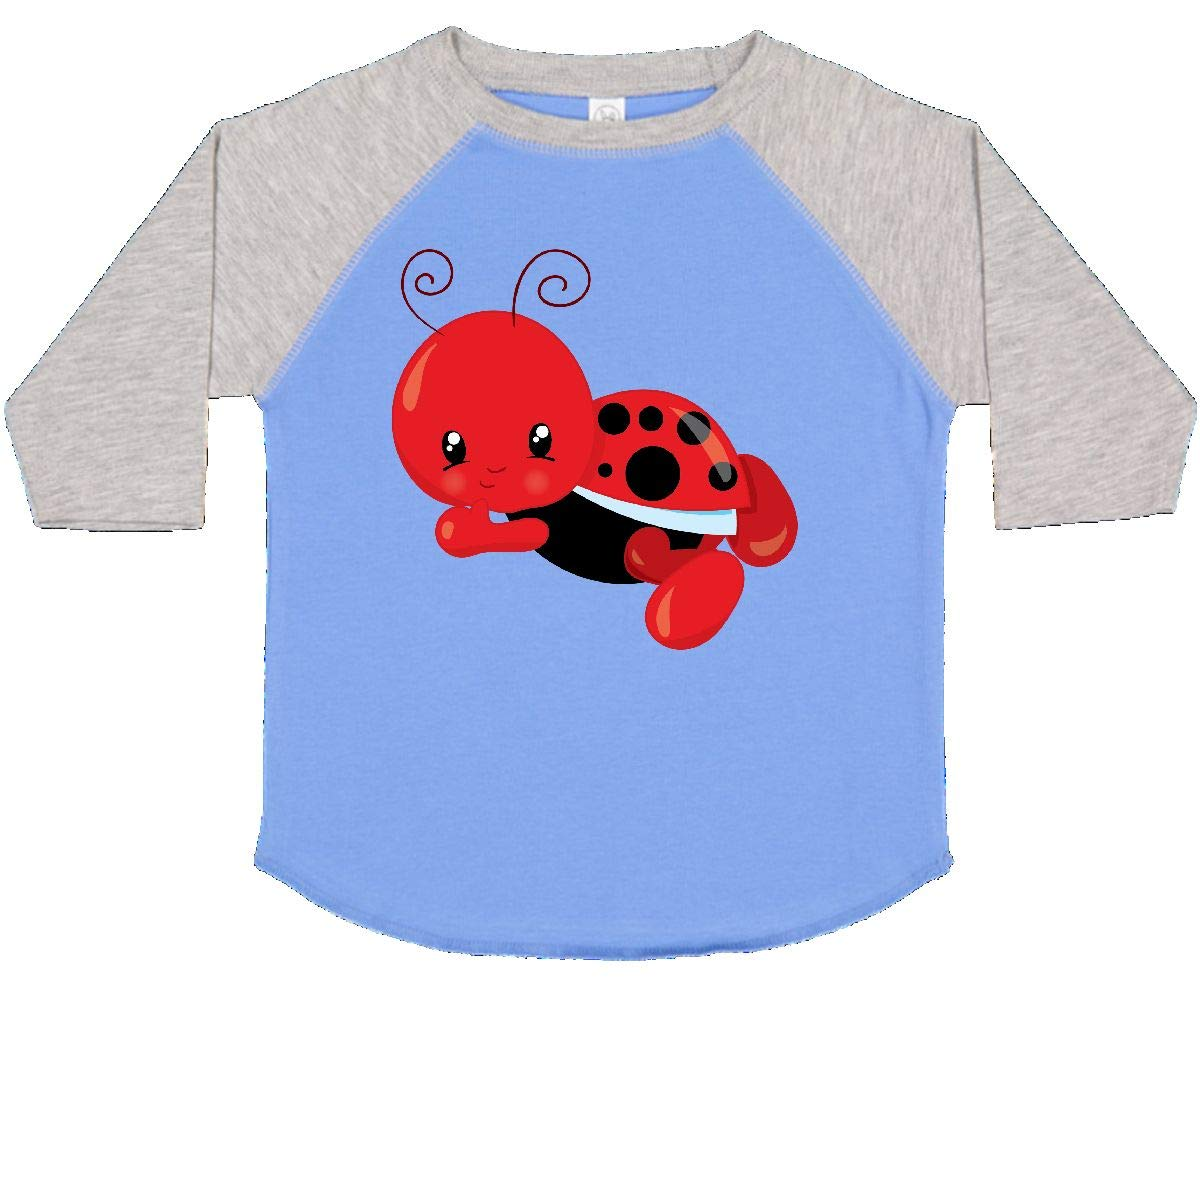 inktastic Adorable Ladybug Toddler T-Shirt